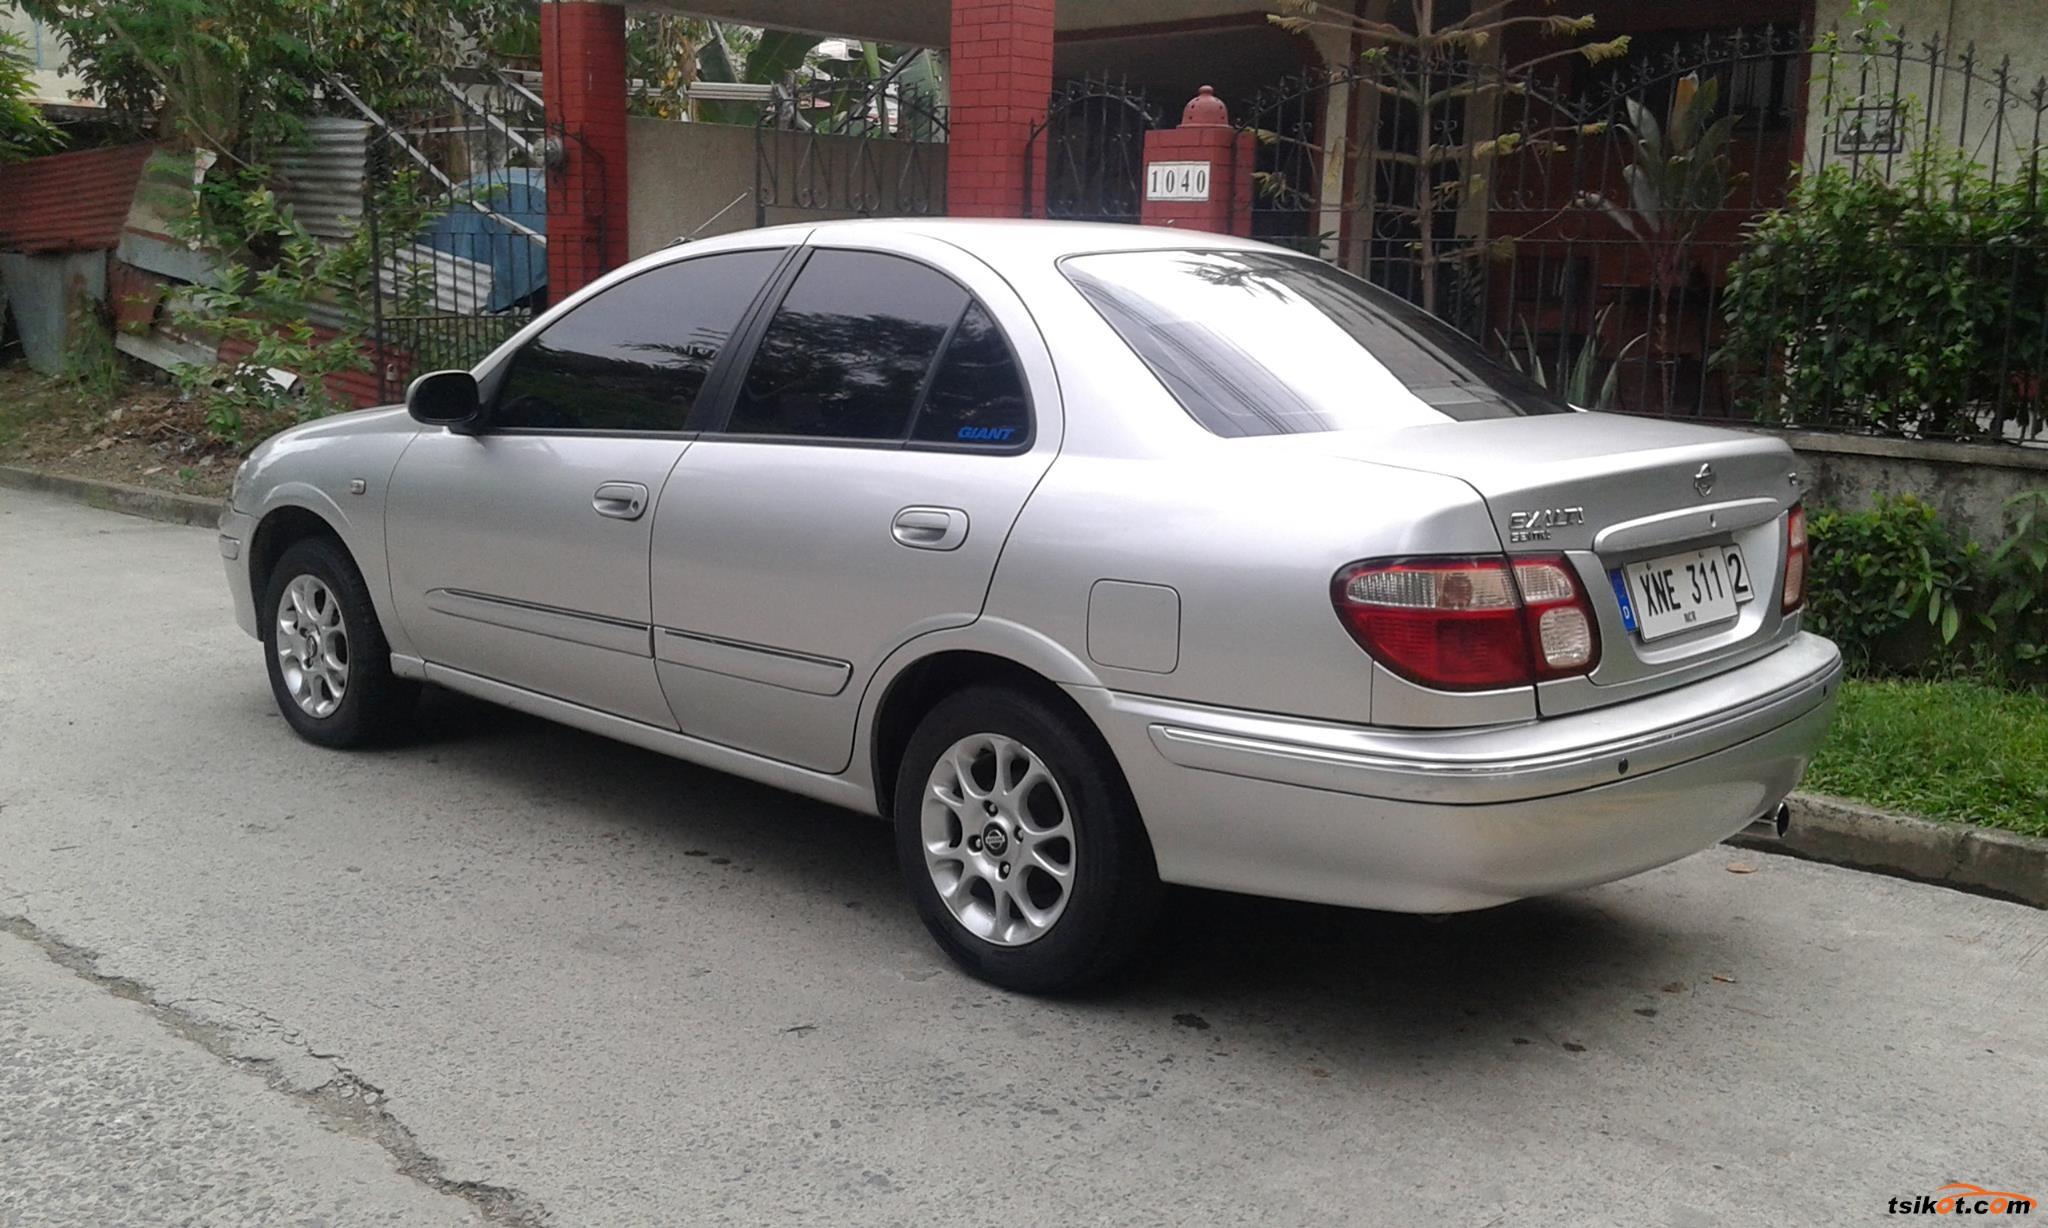 Nissan Sentra 2004 - 3